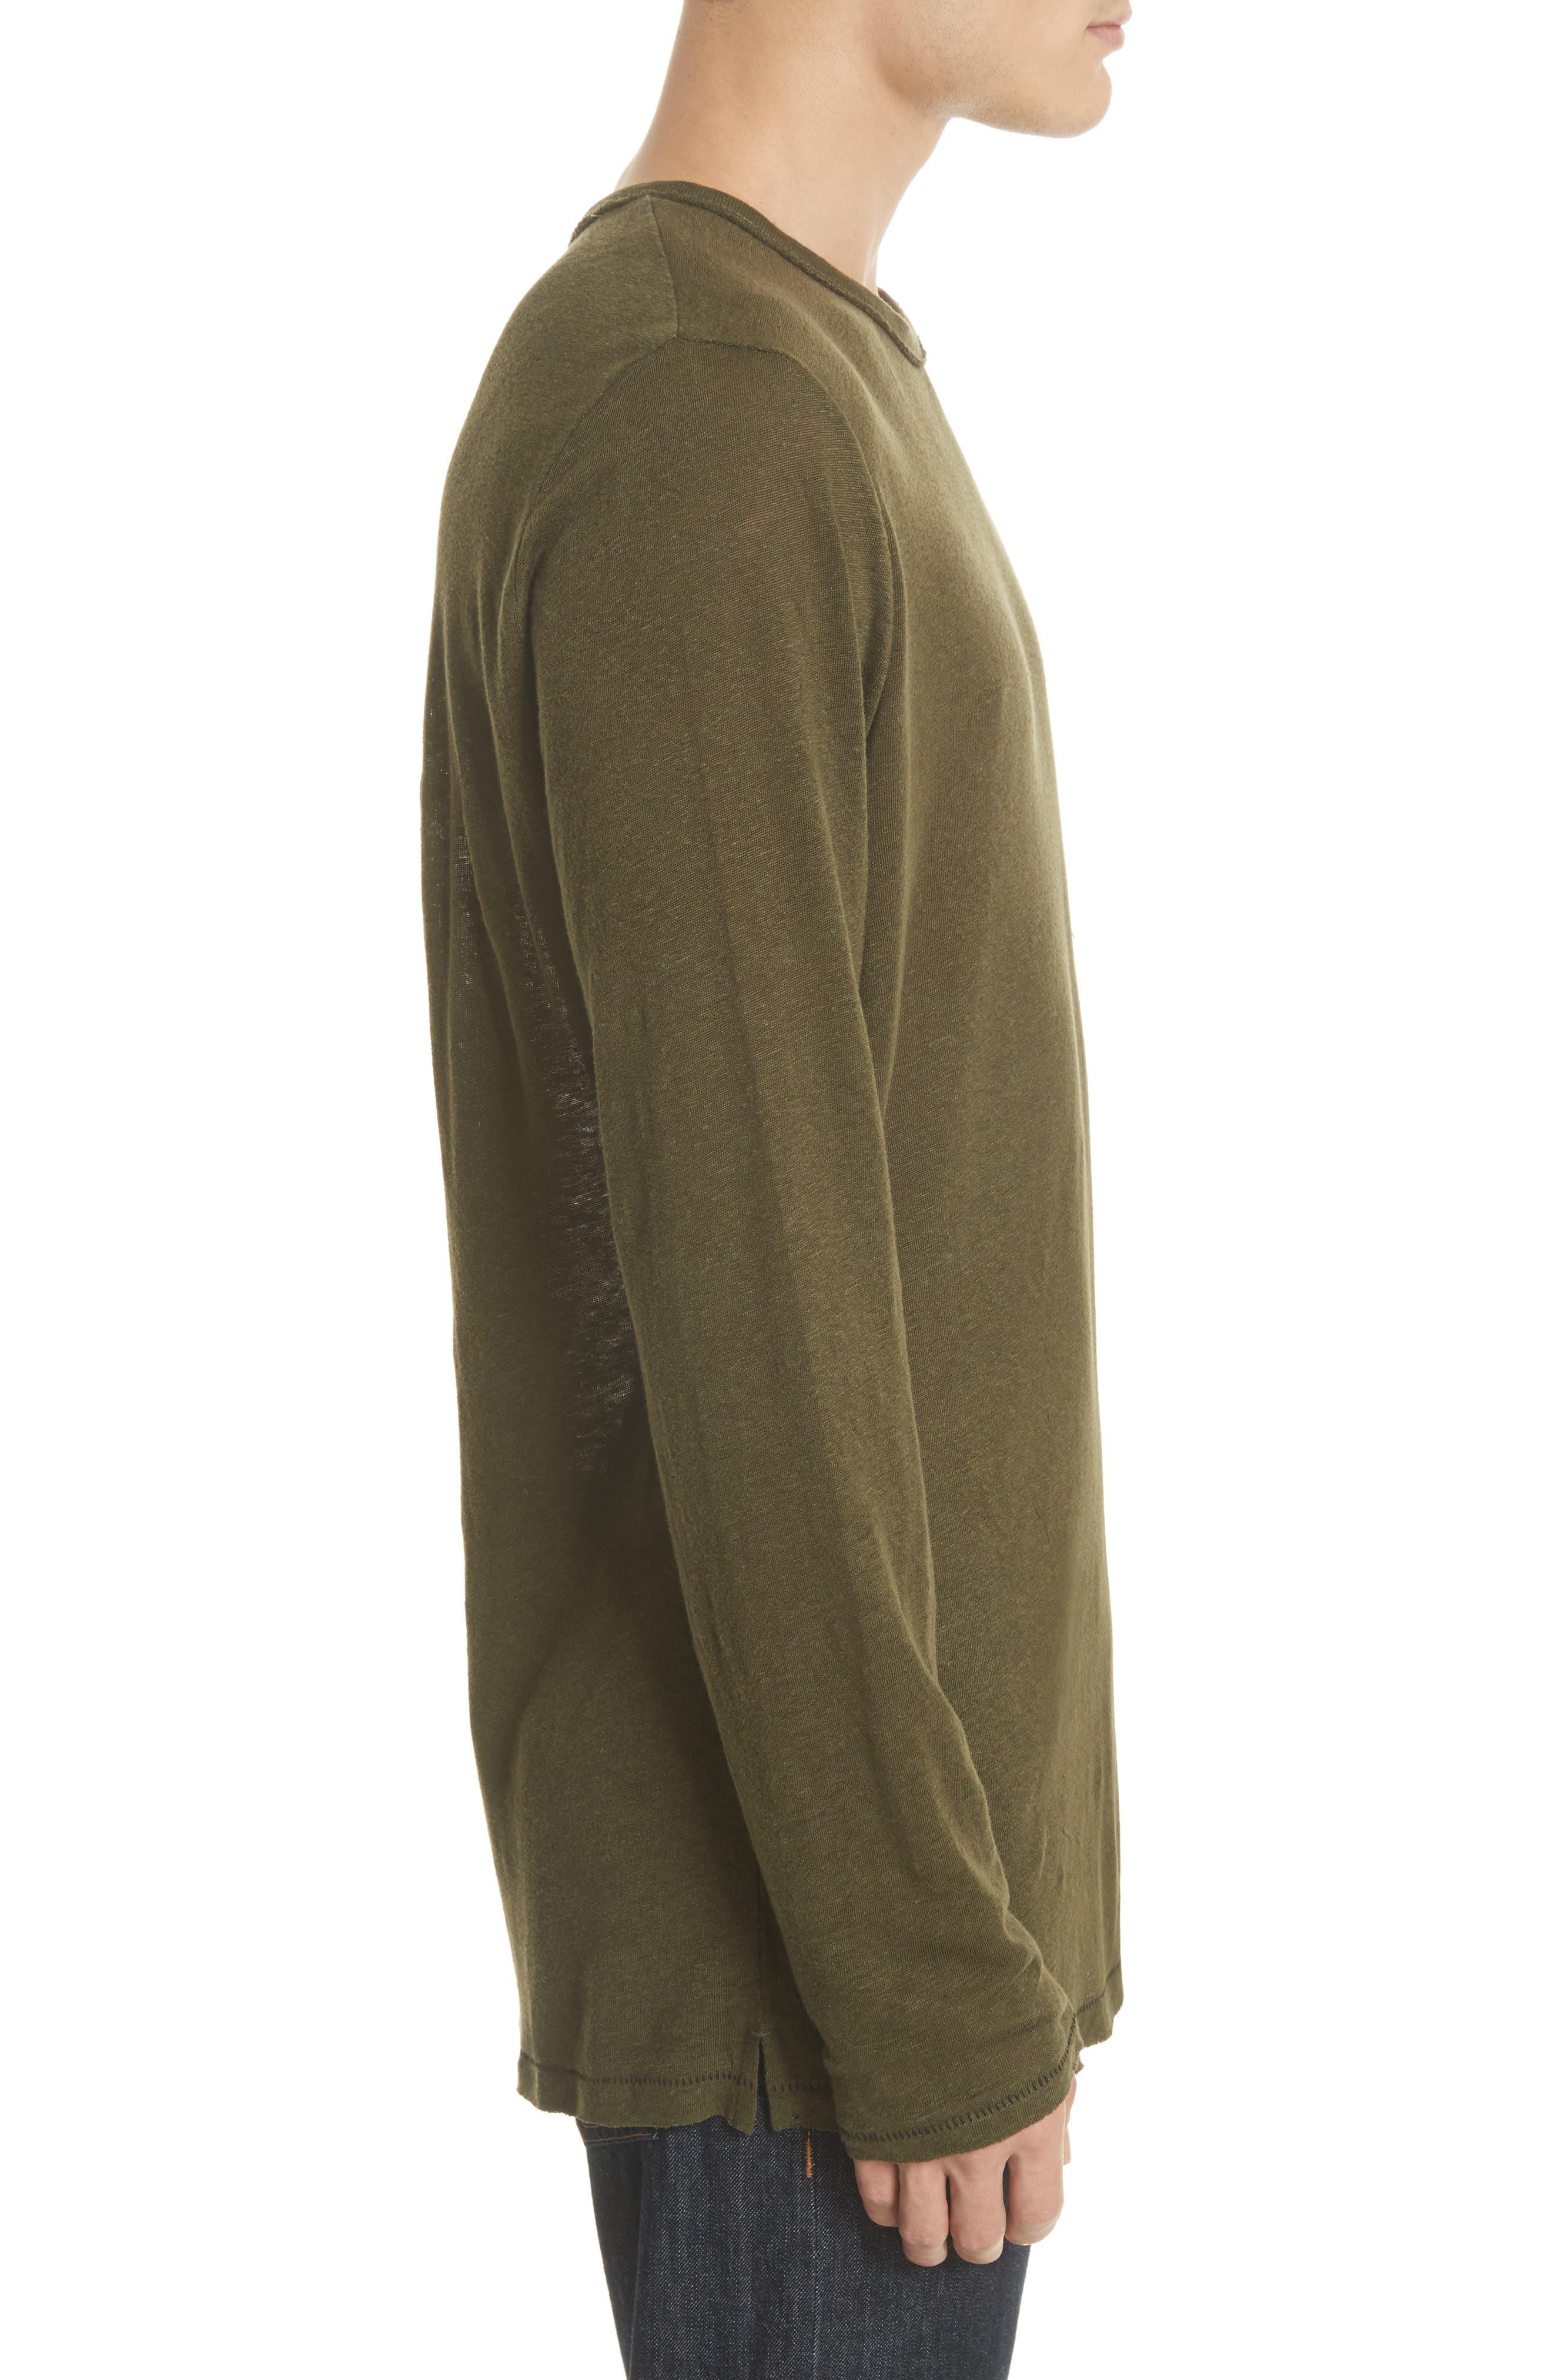 Owen Long Sleeve T-Shirt,                             Alternate thumbnail 3, color,                             Army